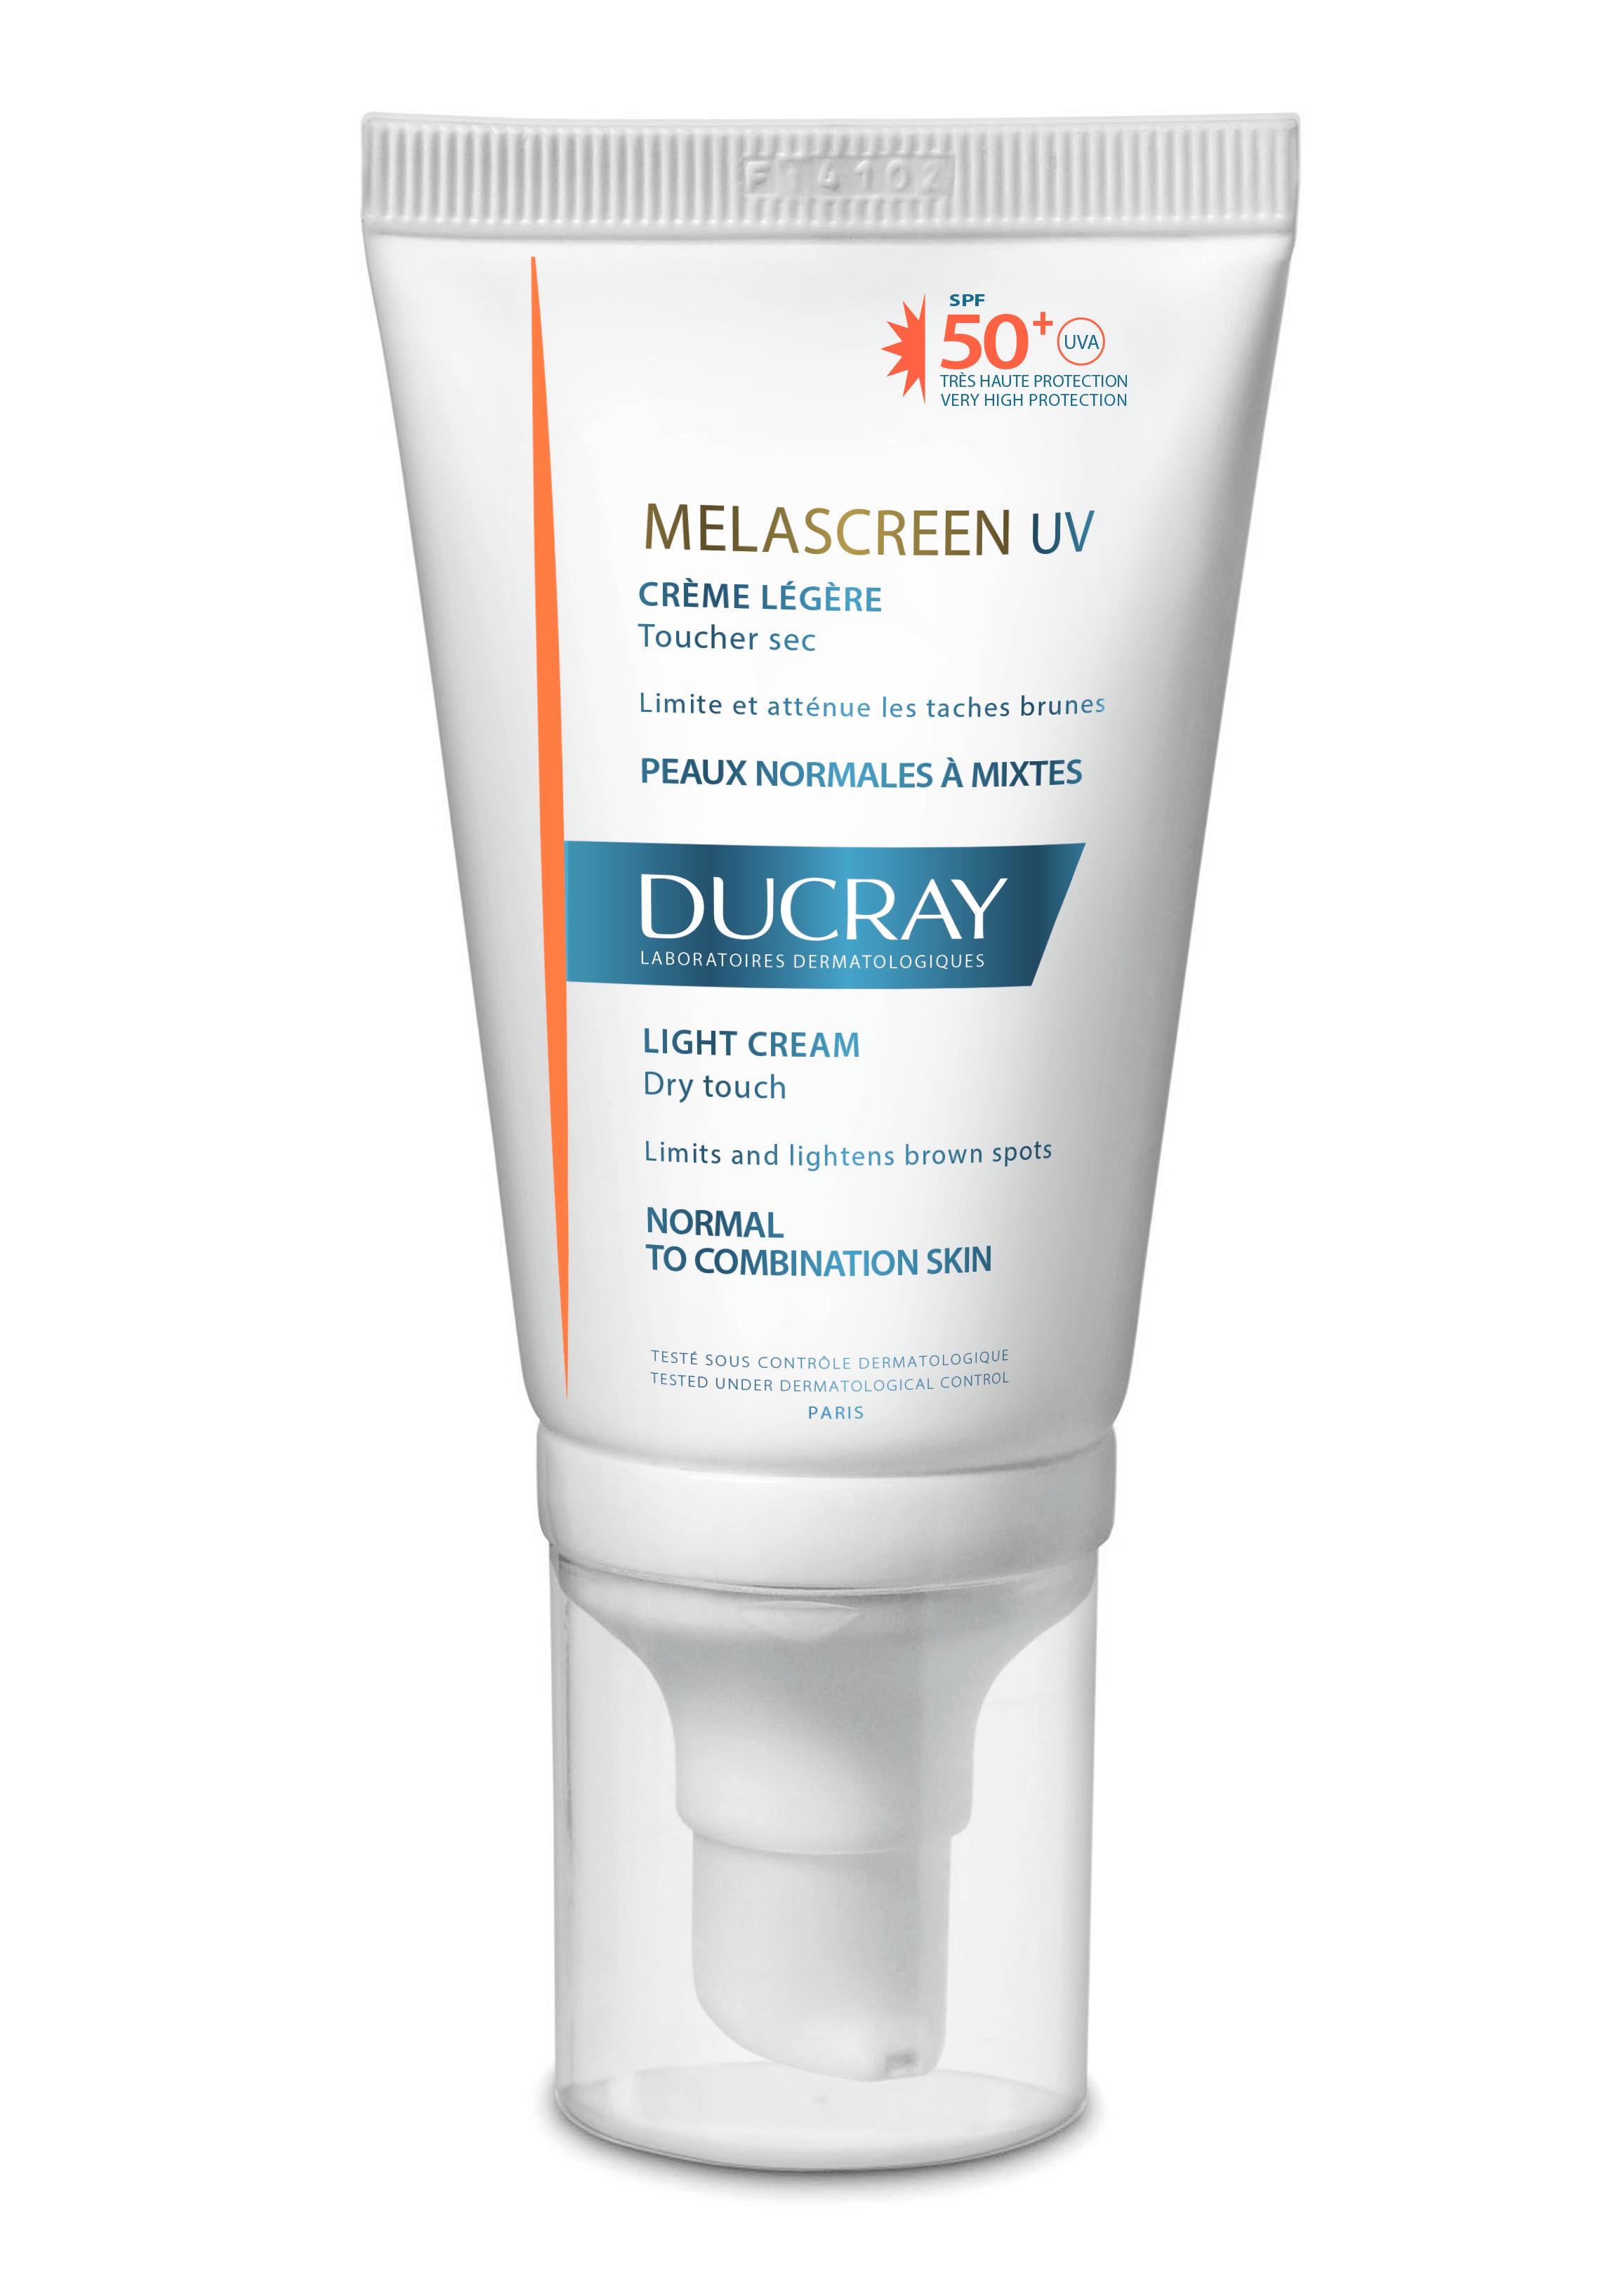 Crema Ligera Melascreen UV 50 Ducray